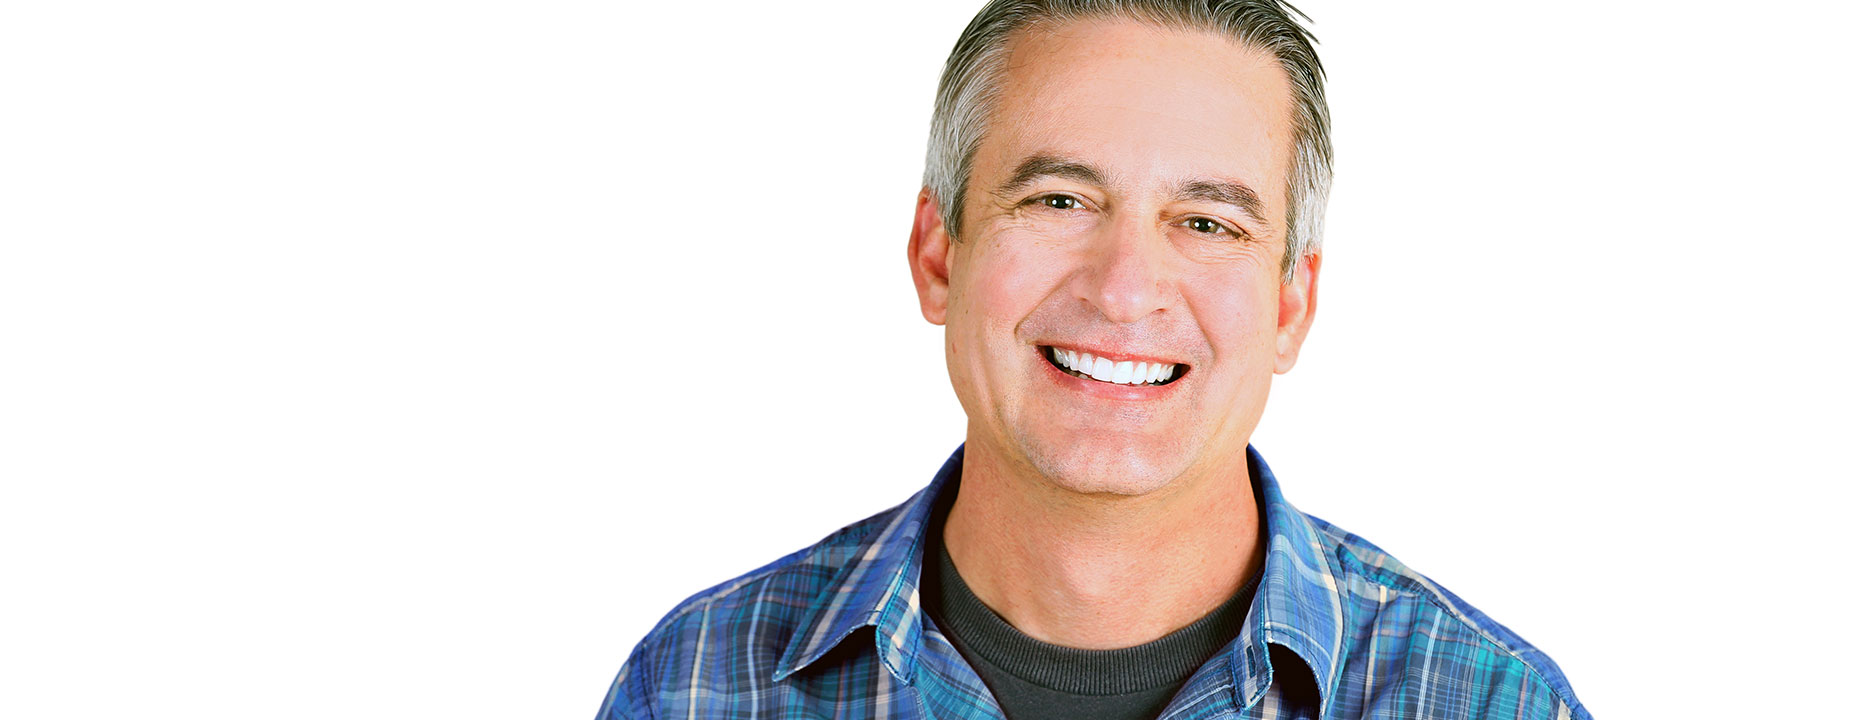 Middle age man smiling after dental implant